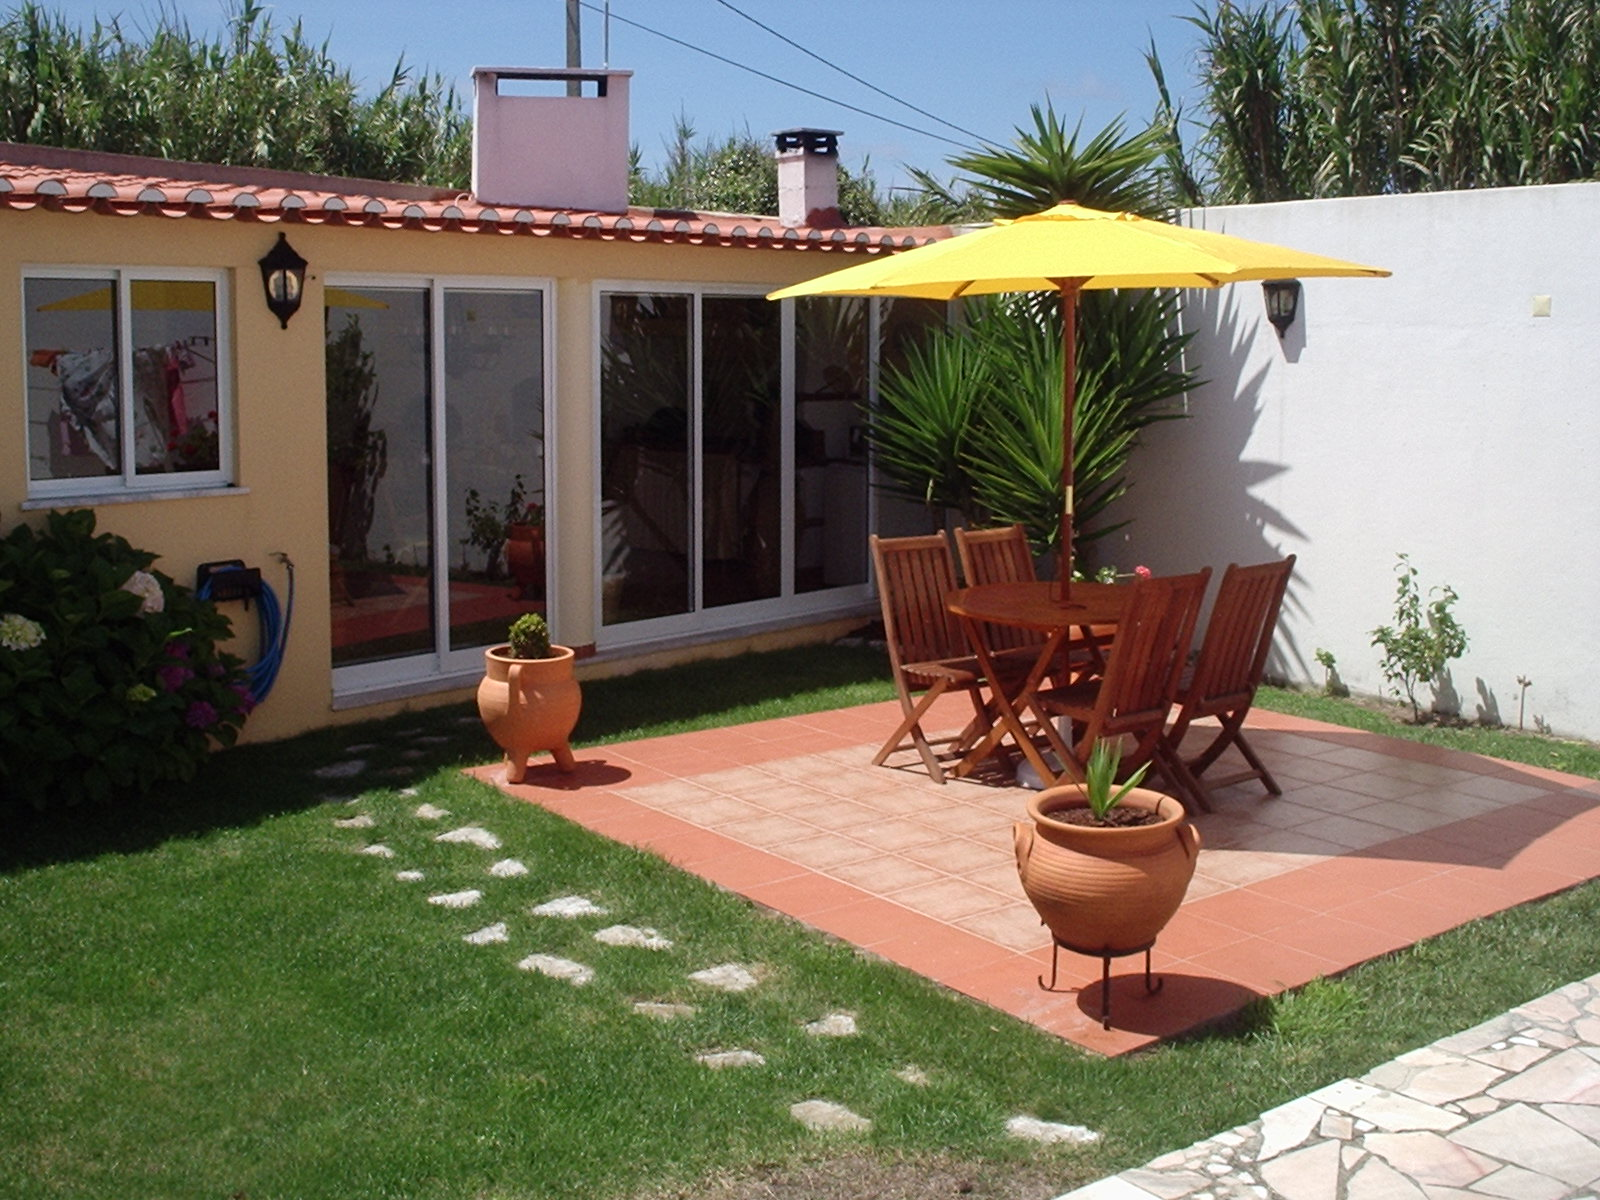 pedras jardim baratas : pedras jardim baratas:Casa.com Quintal